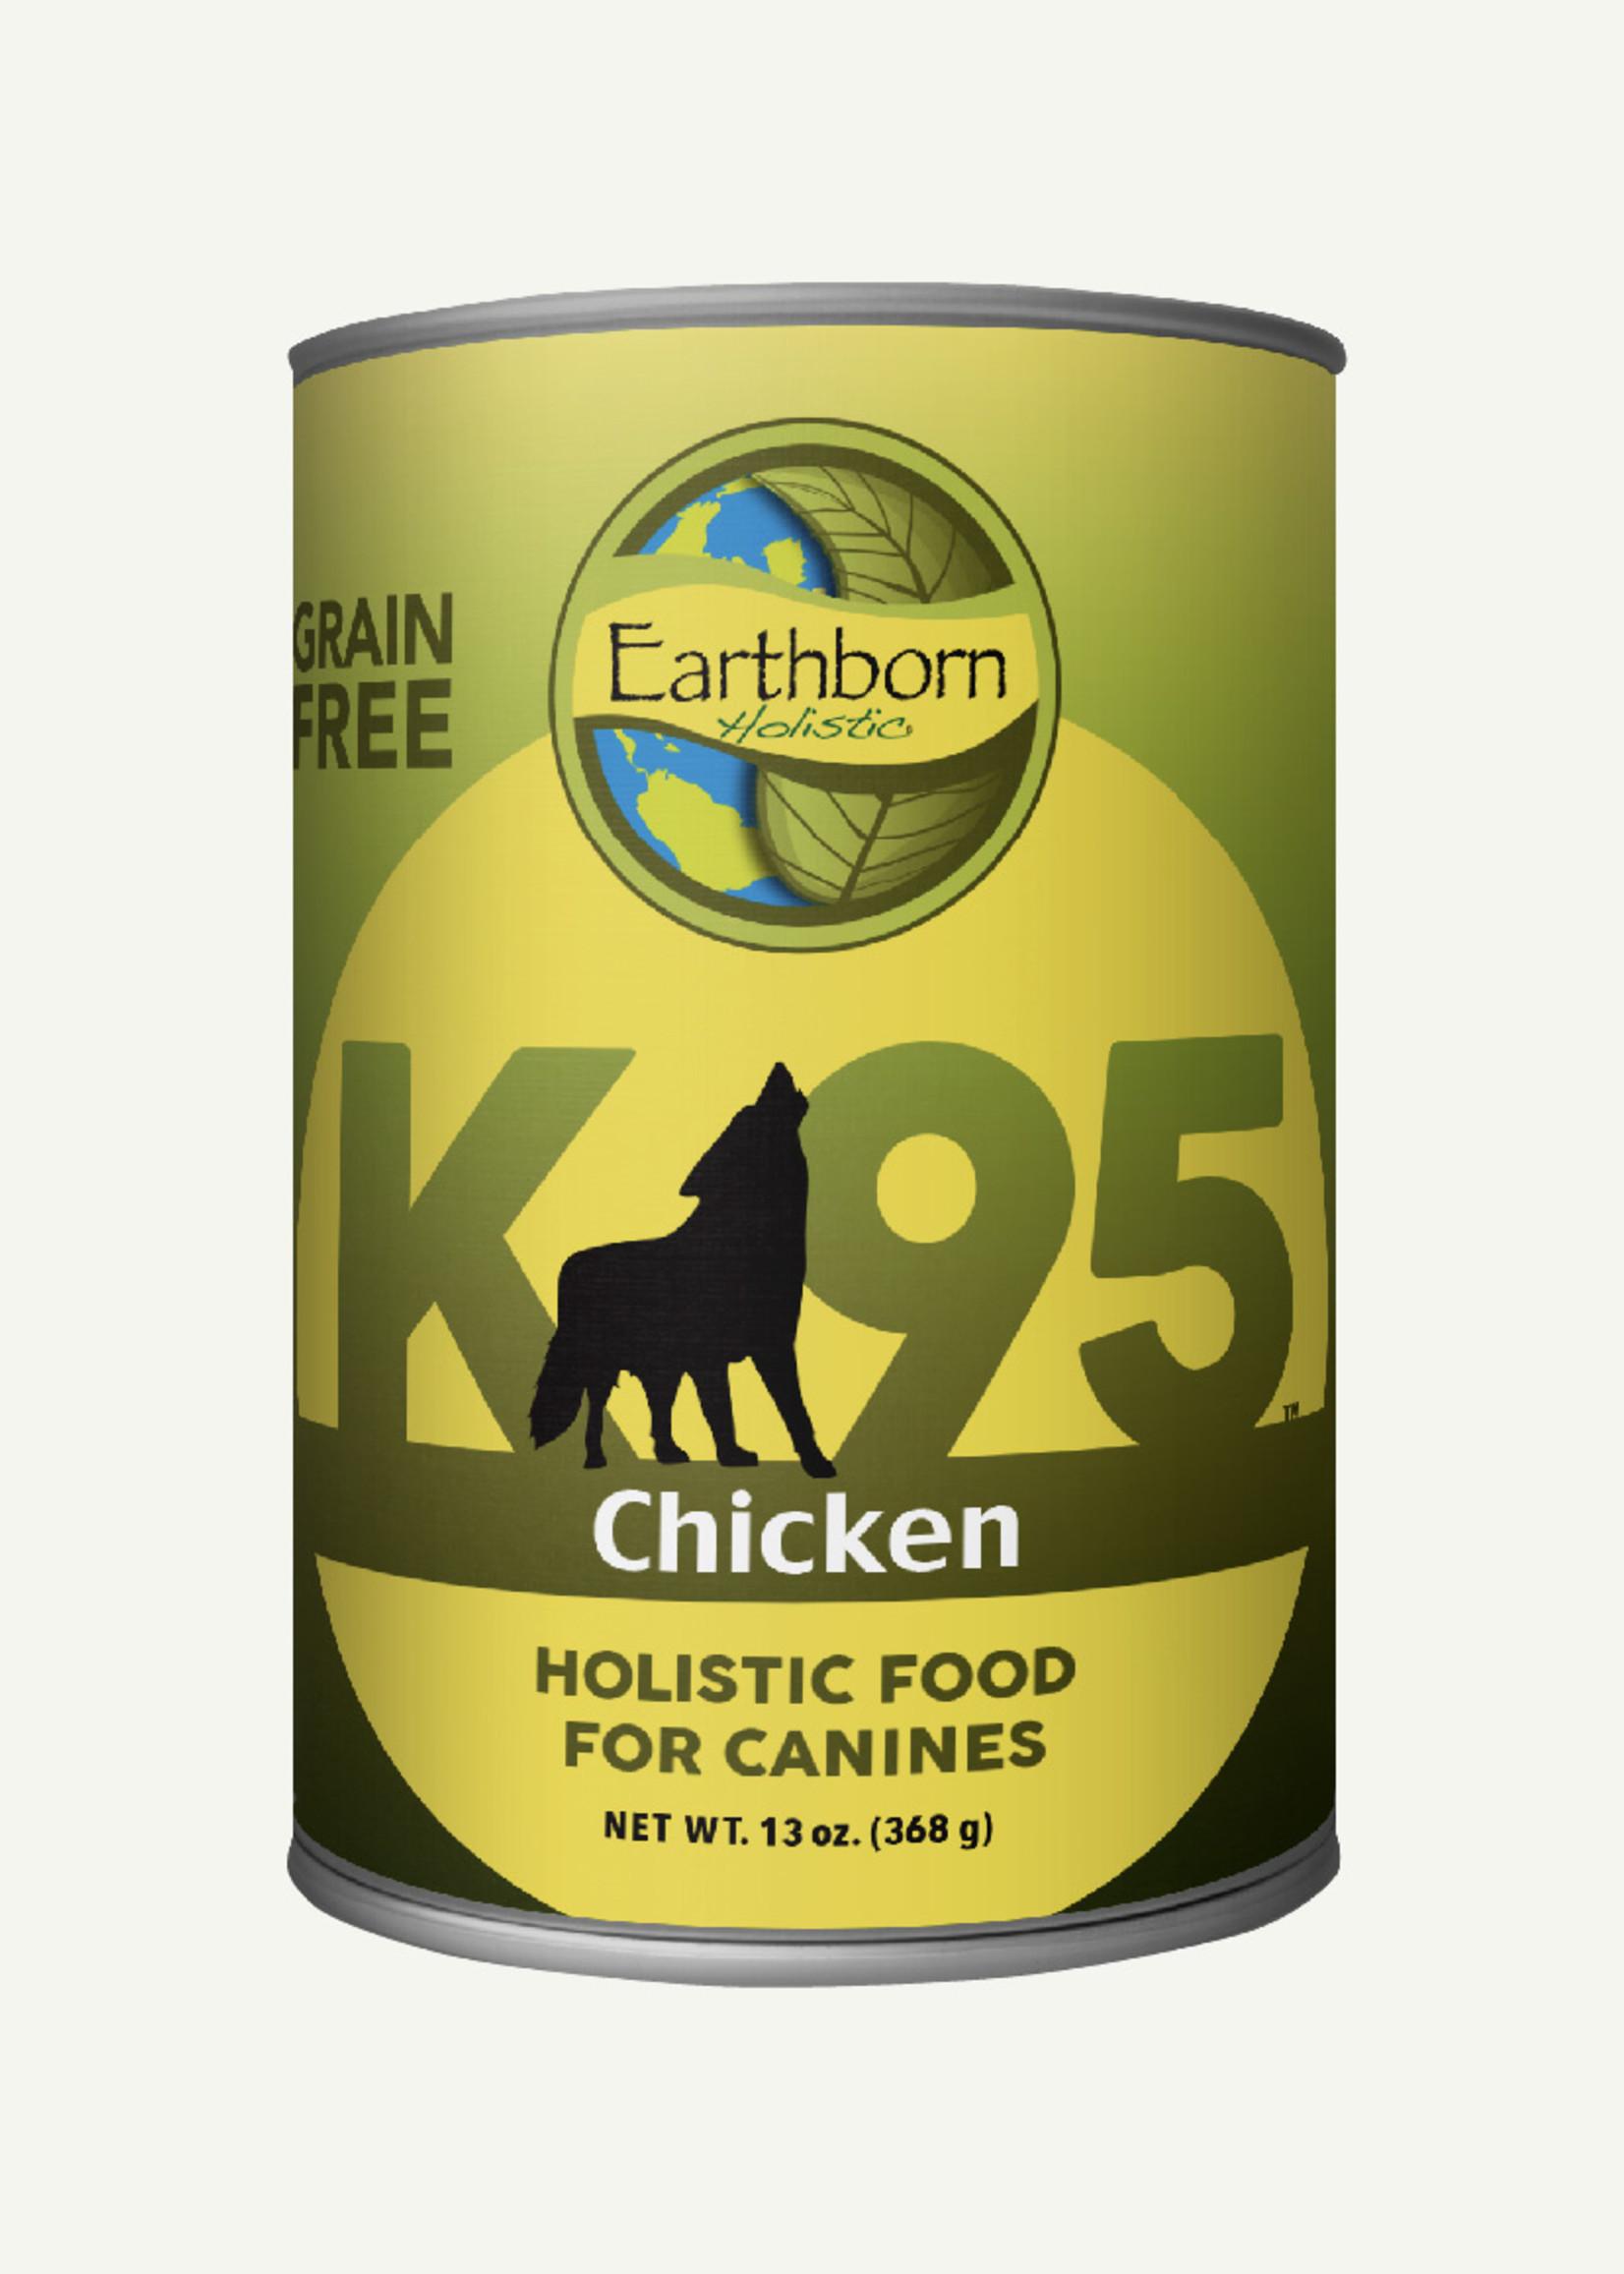 Earthborn Earthborn K95 Chicken Grain Free 13 oz Case